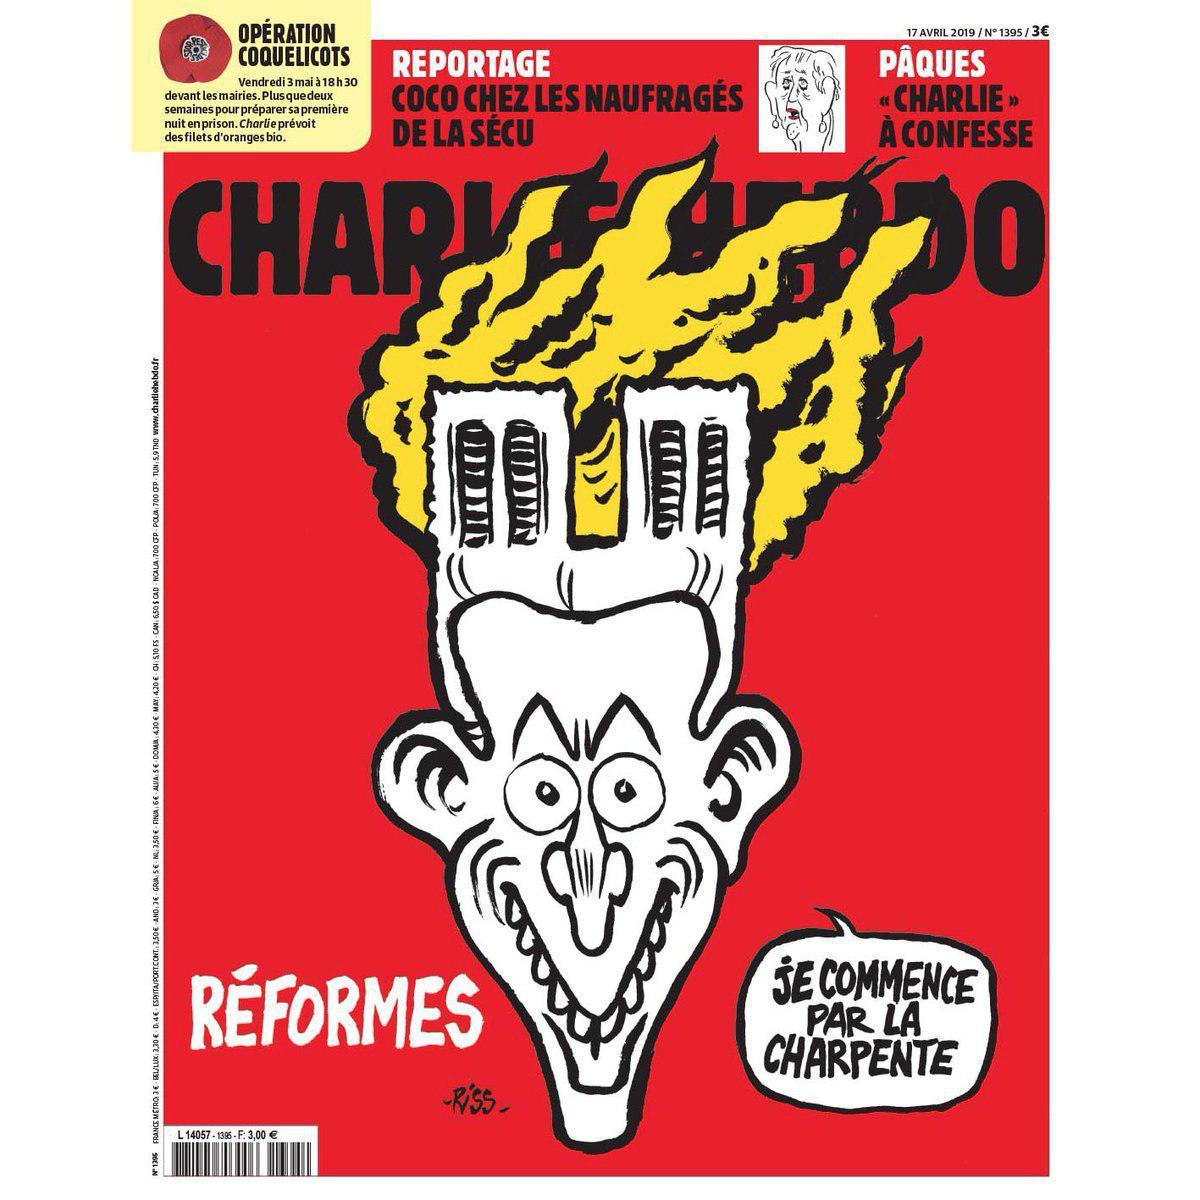 Charlie Hebdo опубликовал карикатуру на пожар в Нотр-Дам-Даме